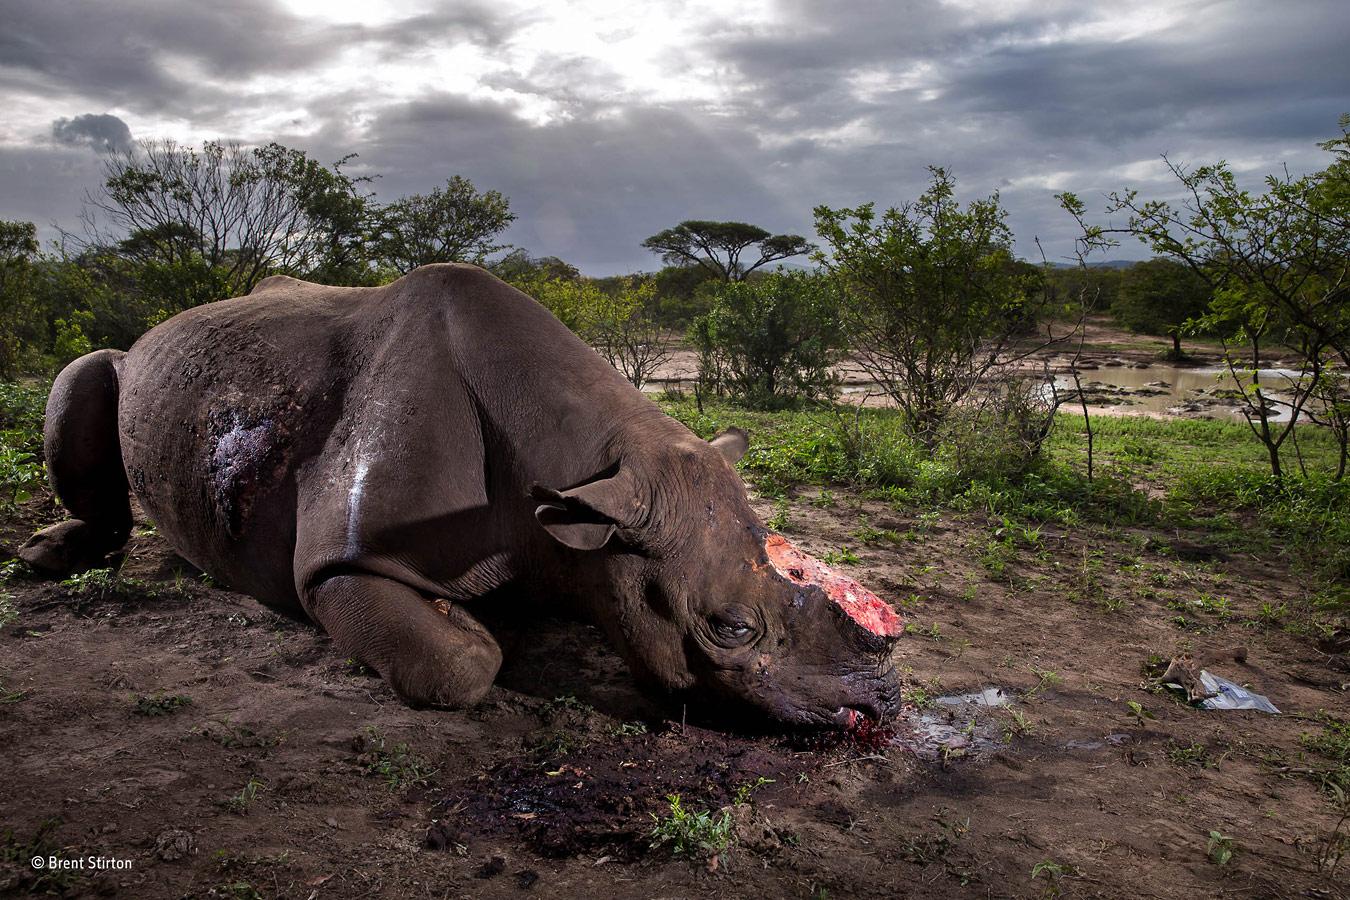 © Брент Стиртон / Brent Stirton, Южная Африка, Фотограф года дикой природы 2017, Гран-при конкурса — Wildlife Photographer of the Year